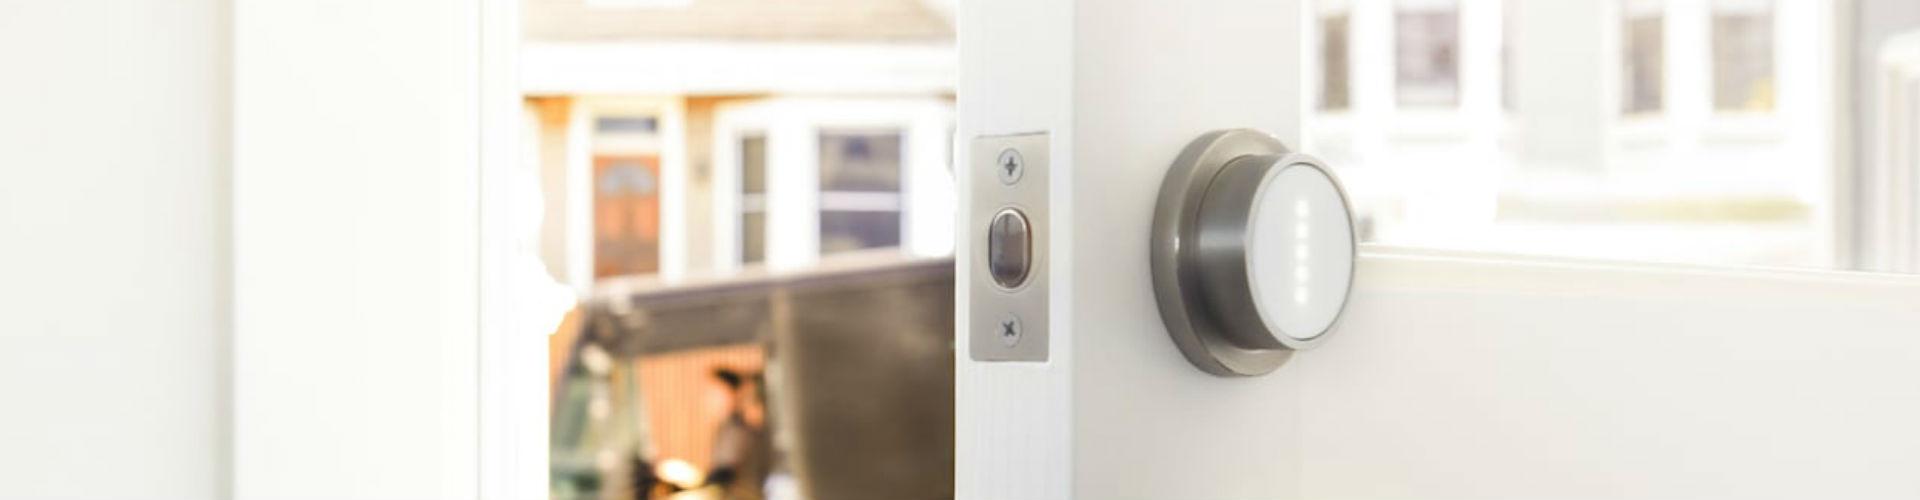 Smart home series – Are smart door locks secure enough?